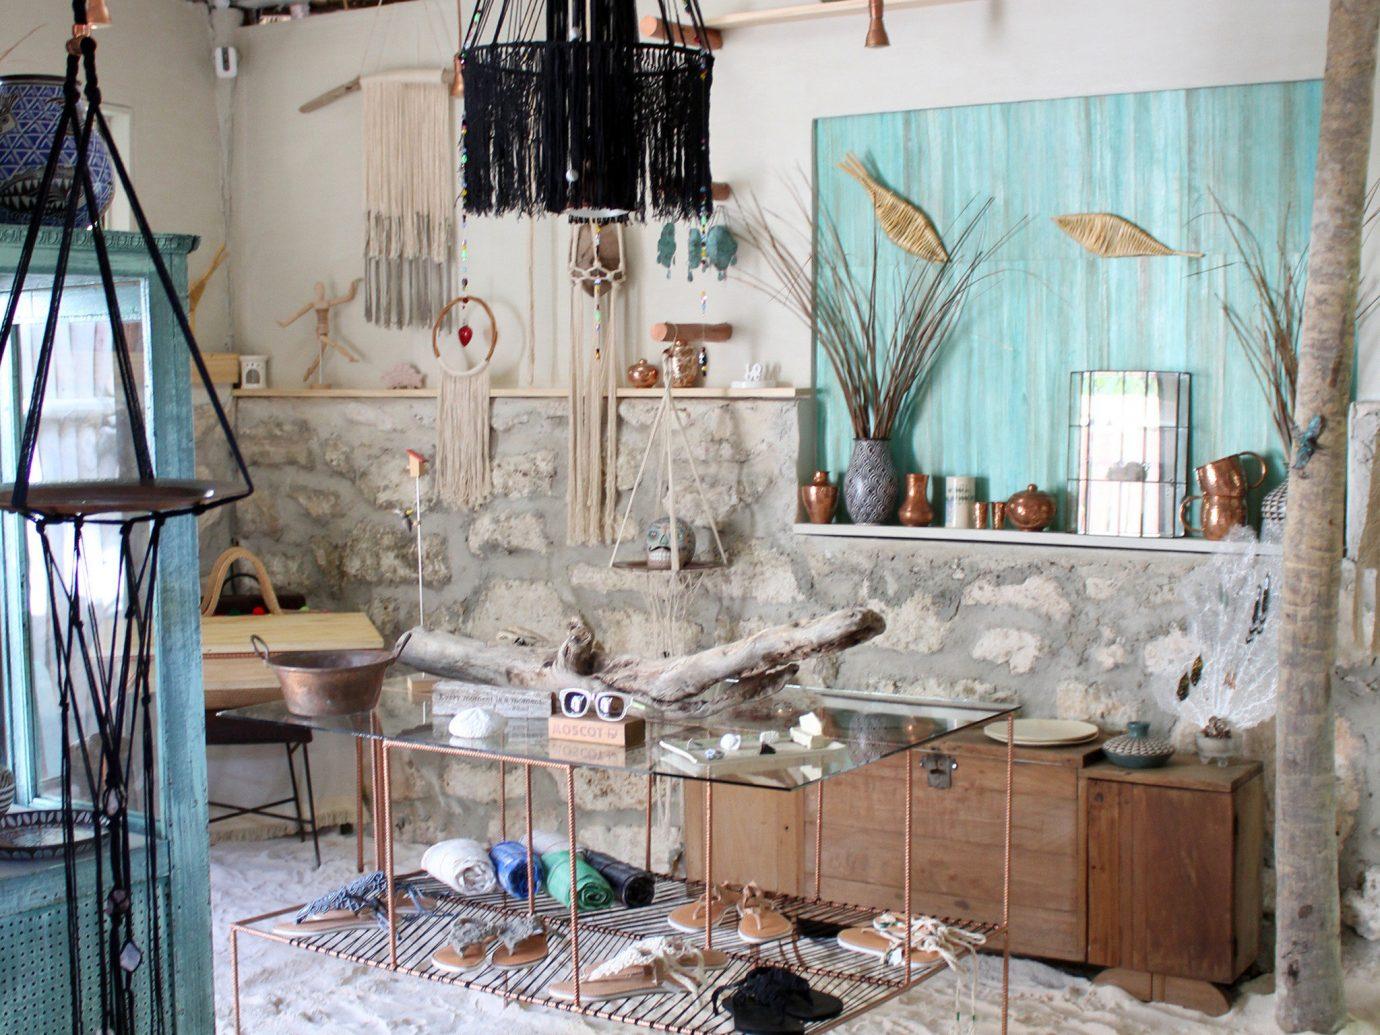 City Mexico Trip Ideas Tulum Winter window interior design